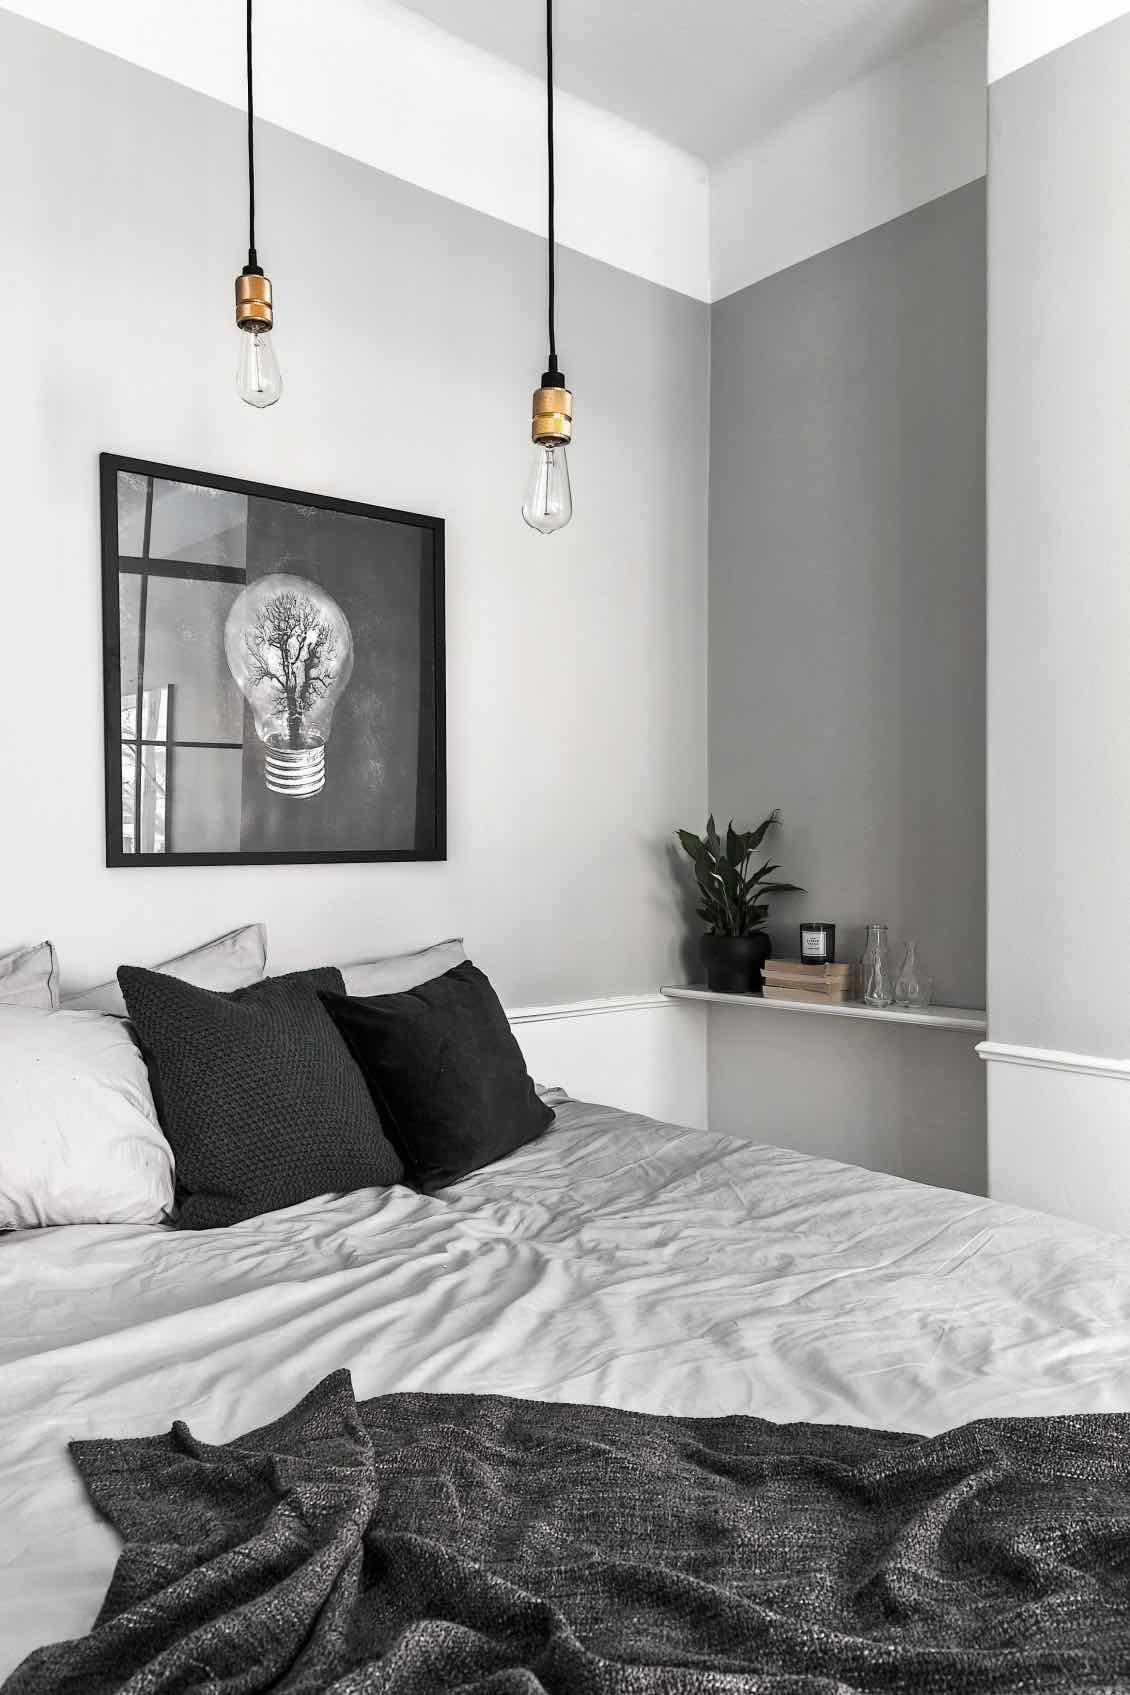 Schlafzimmer Lampe Design Ideen Schlafzimmer Lampe Design Ideen